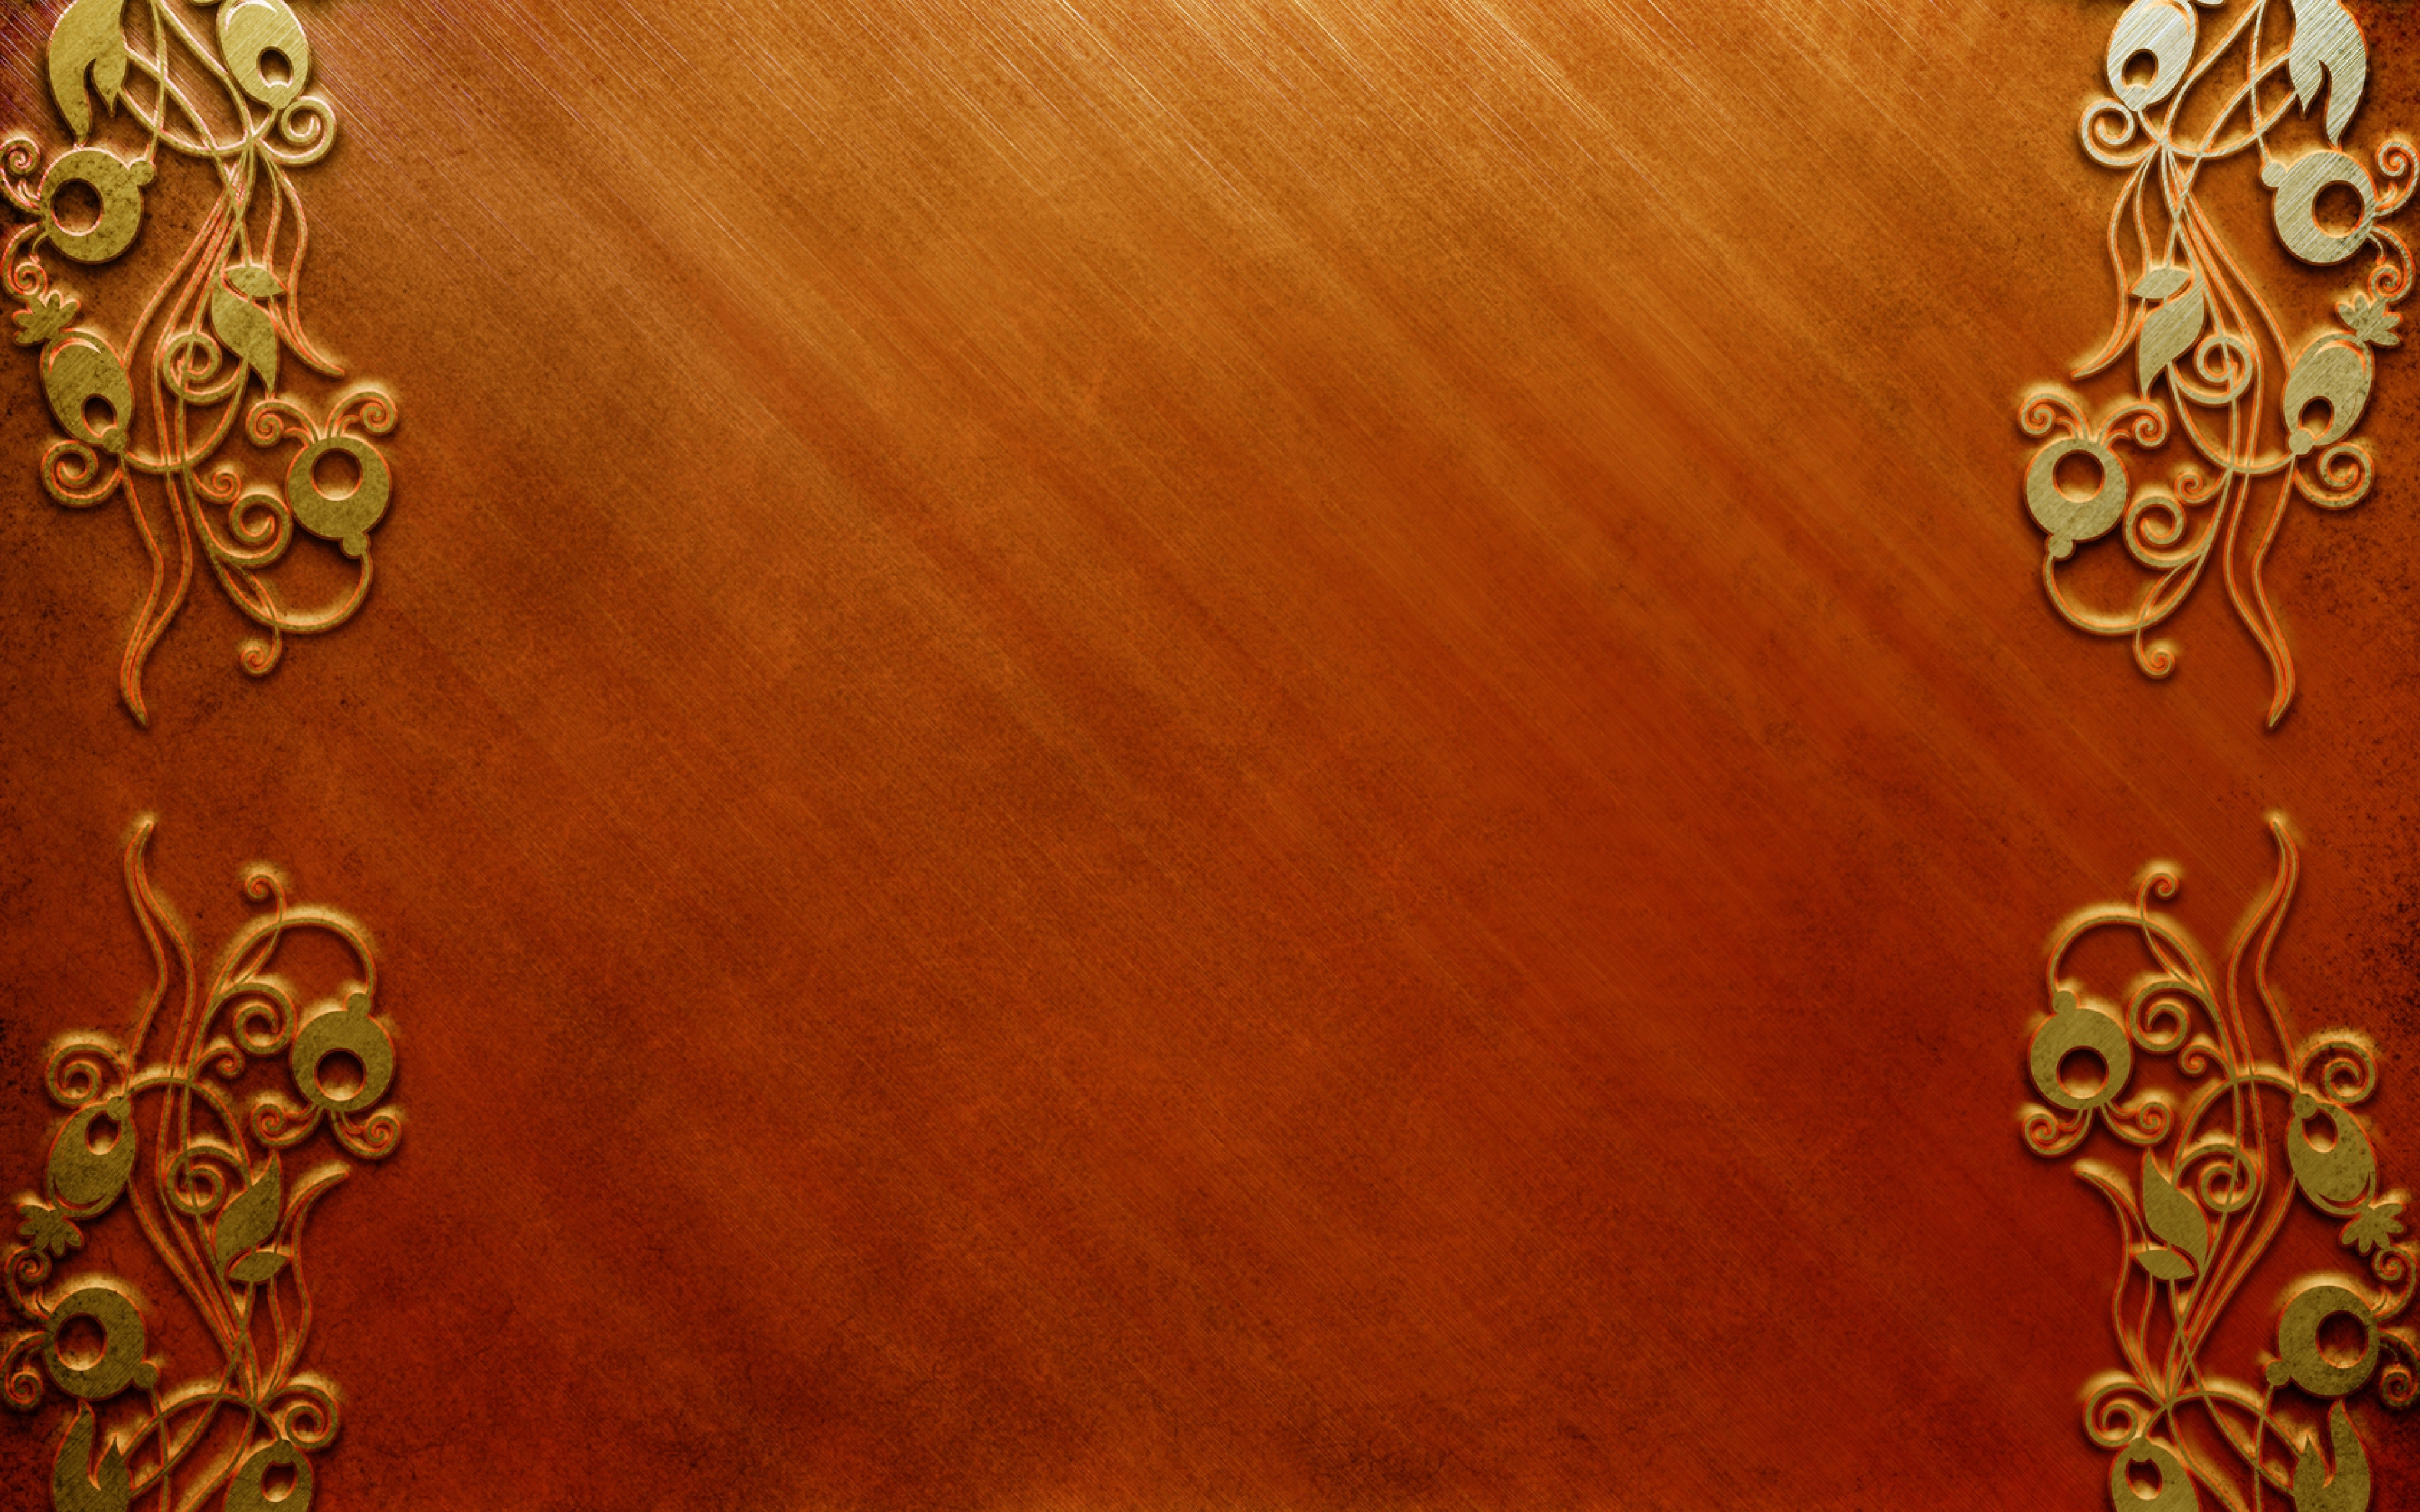 Pattern Background Surface Wood Wallpaper Background Ultra HD 4K 3840x2400